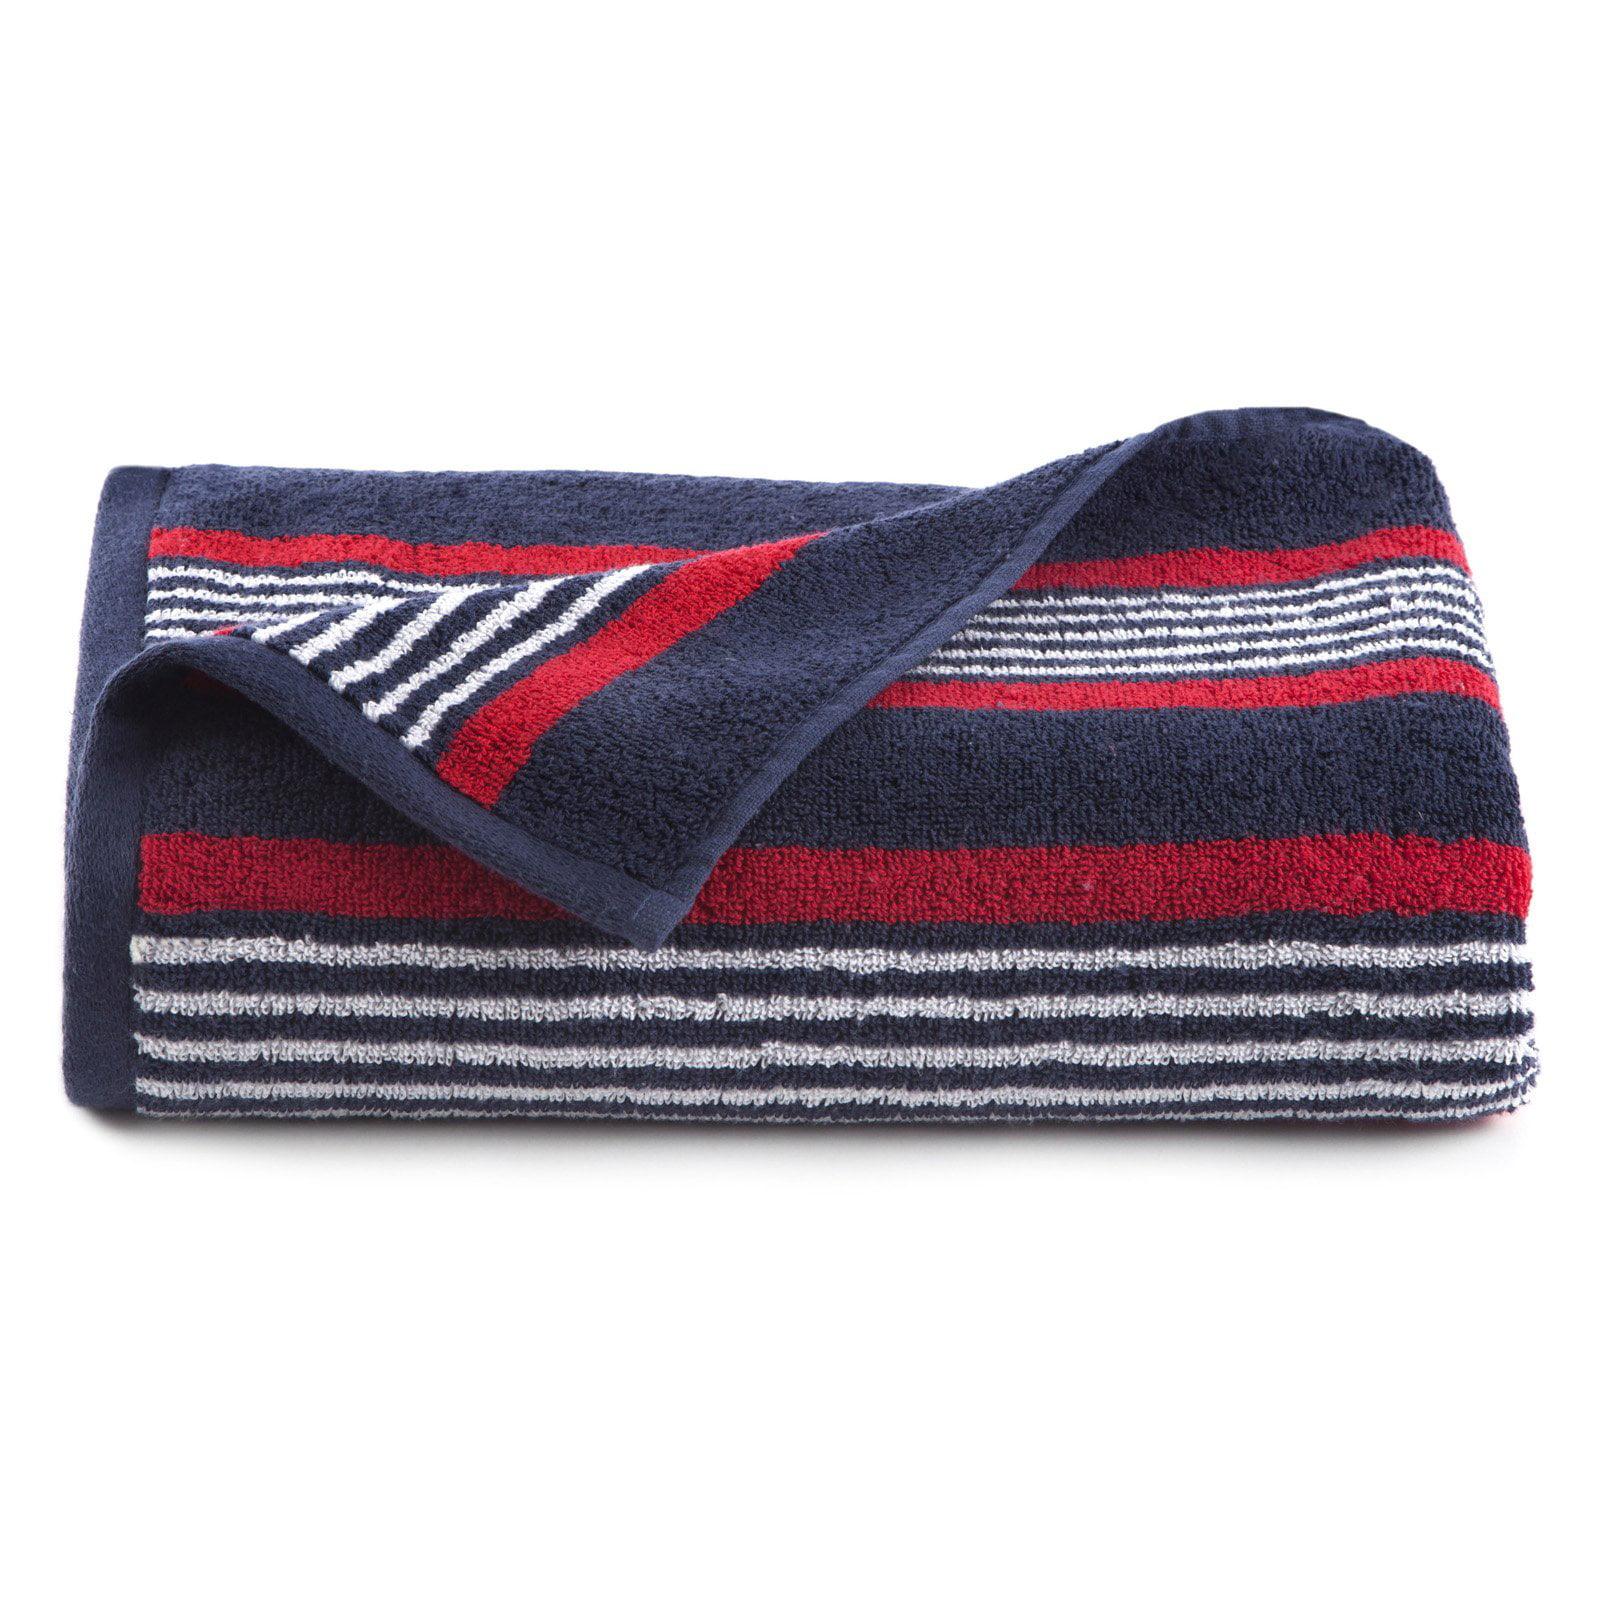 IZOD Racer Stripe Bath Towel Set Set of 2 by Overstock